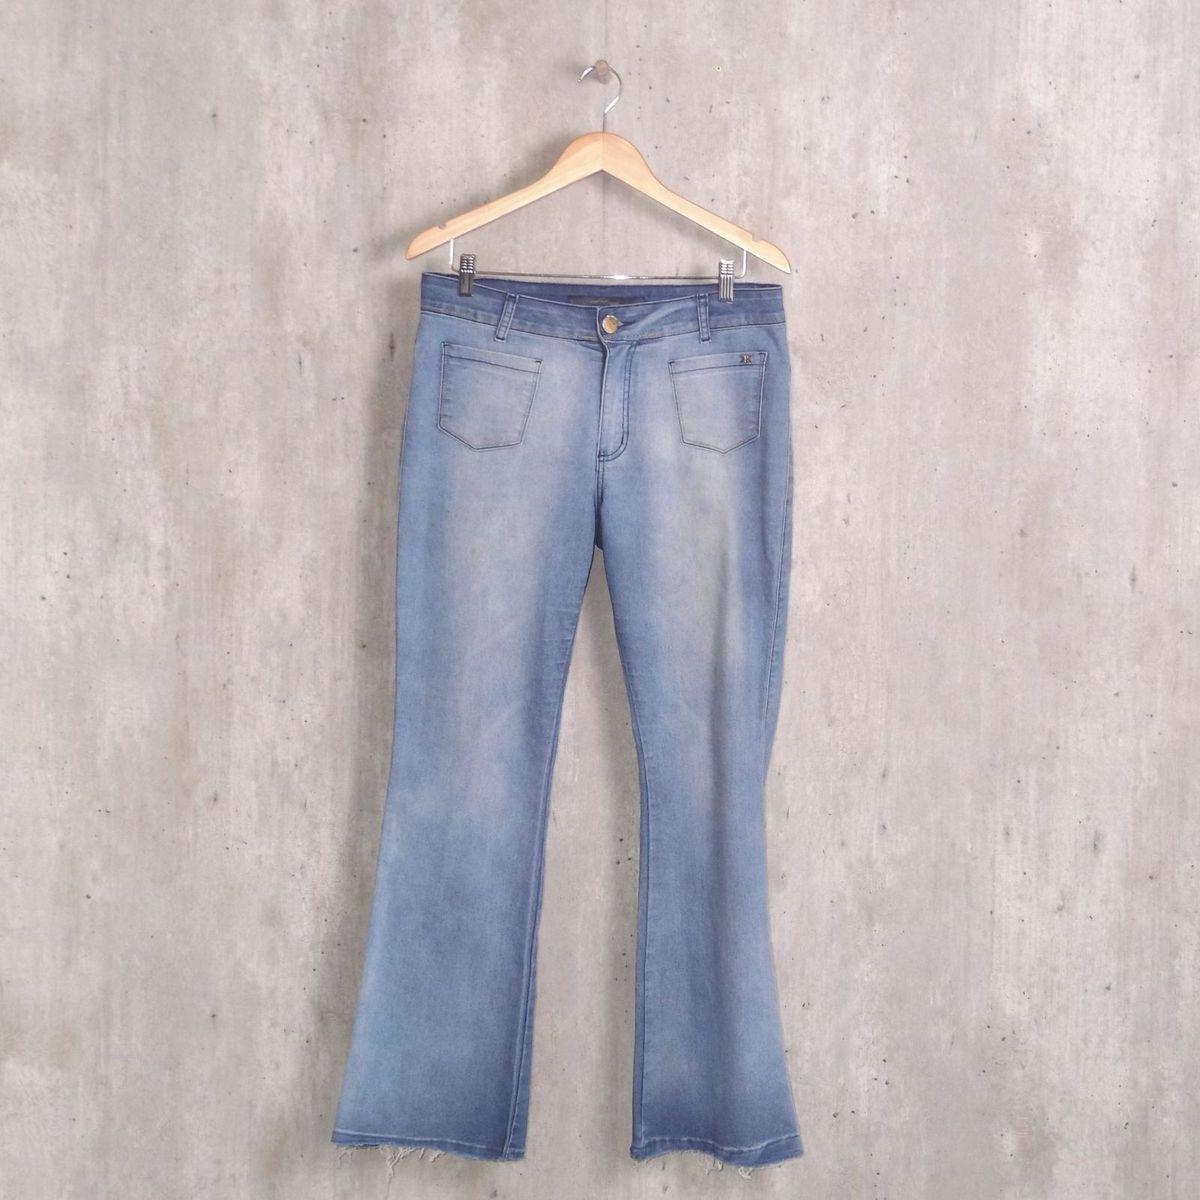 d9ed1882b Calça Azul Flare em Sarja | Calça Feminina Mokkai Usado 31008541 | enjoei